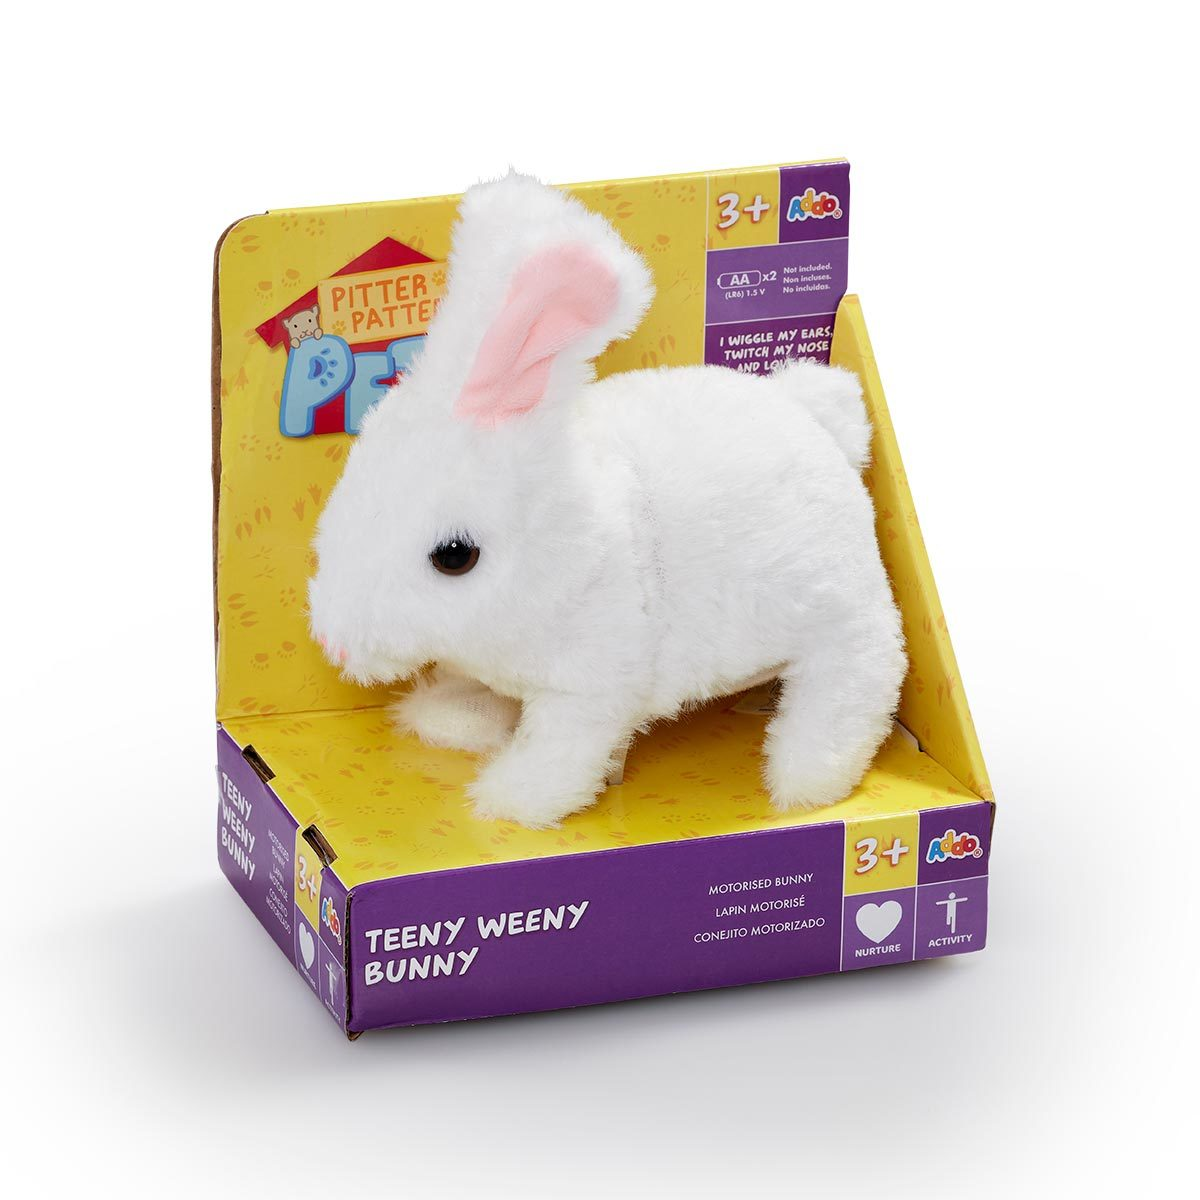 Pitter Patter Pets Teeny Weeny Bunny - White Bunny